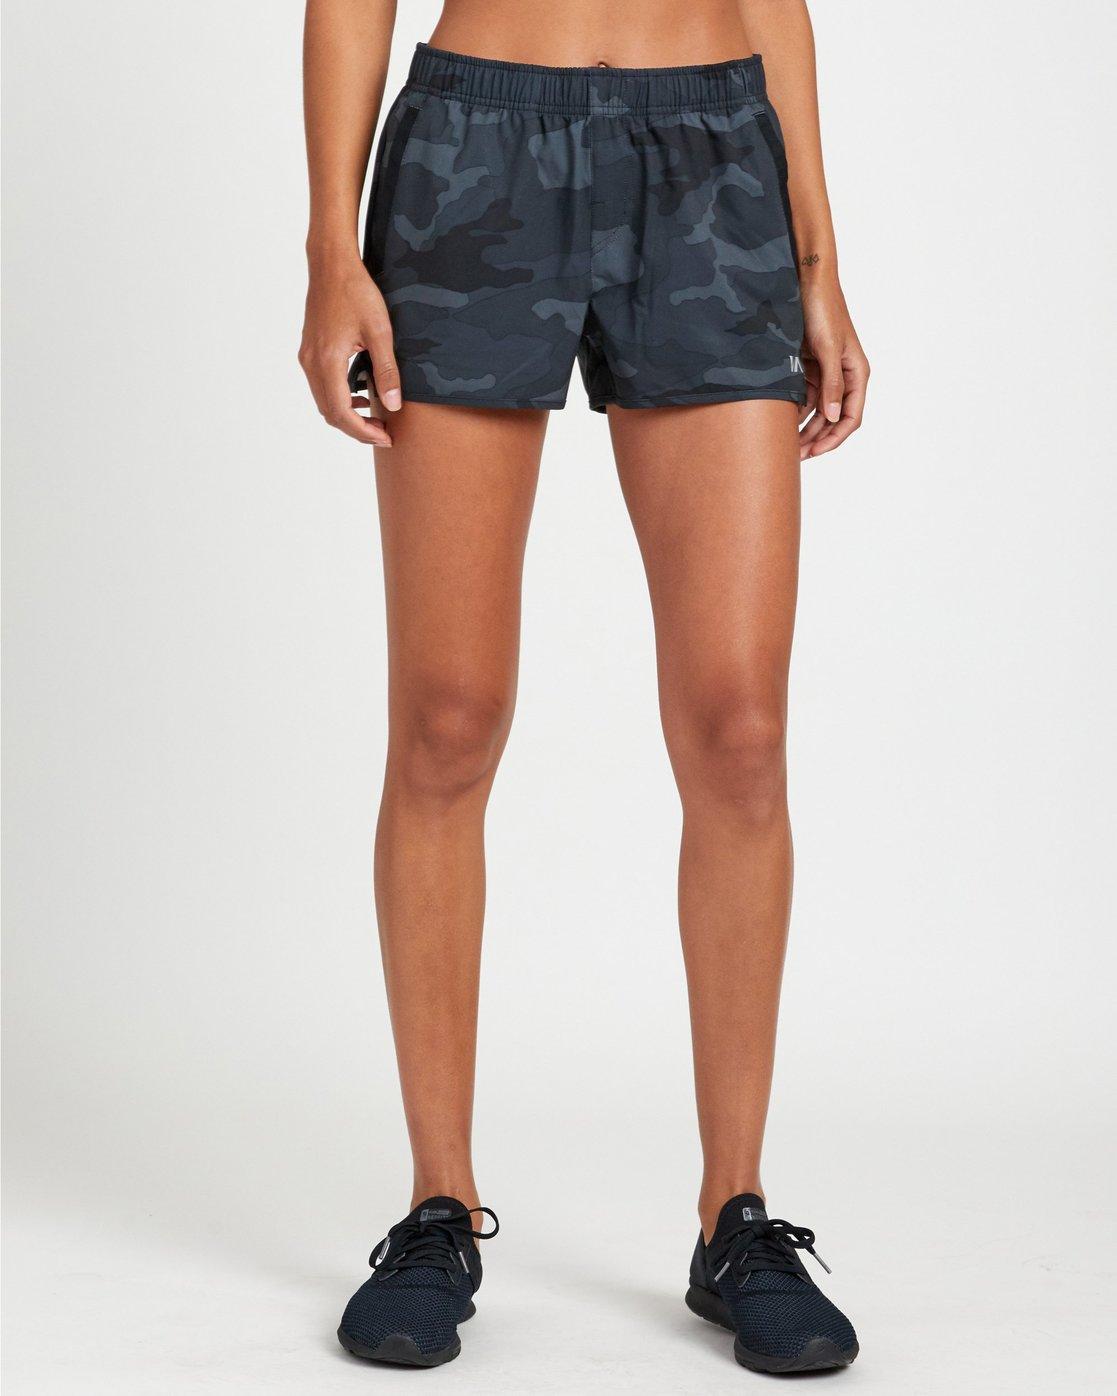 0 Womens Yogger Stretch Shorts Camo R493313 RVCA